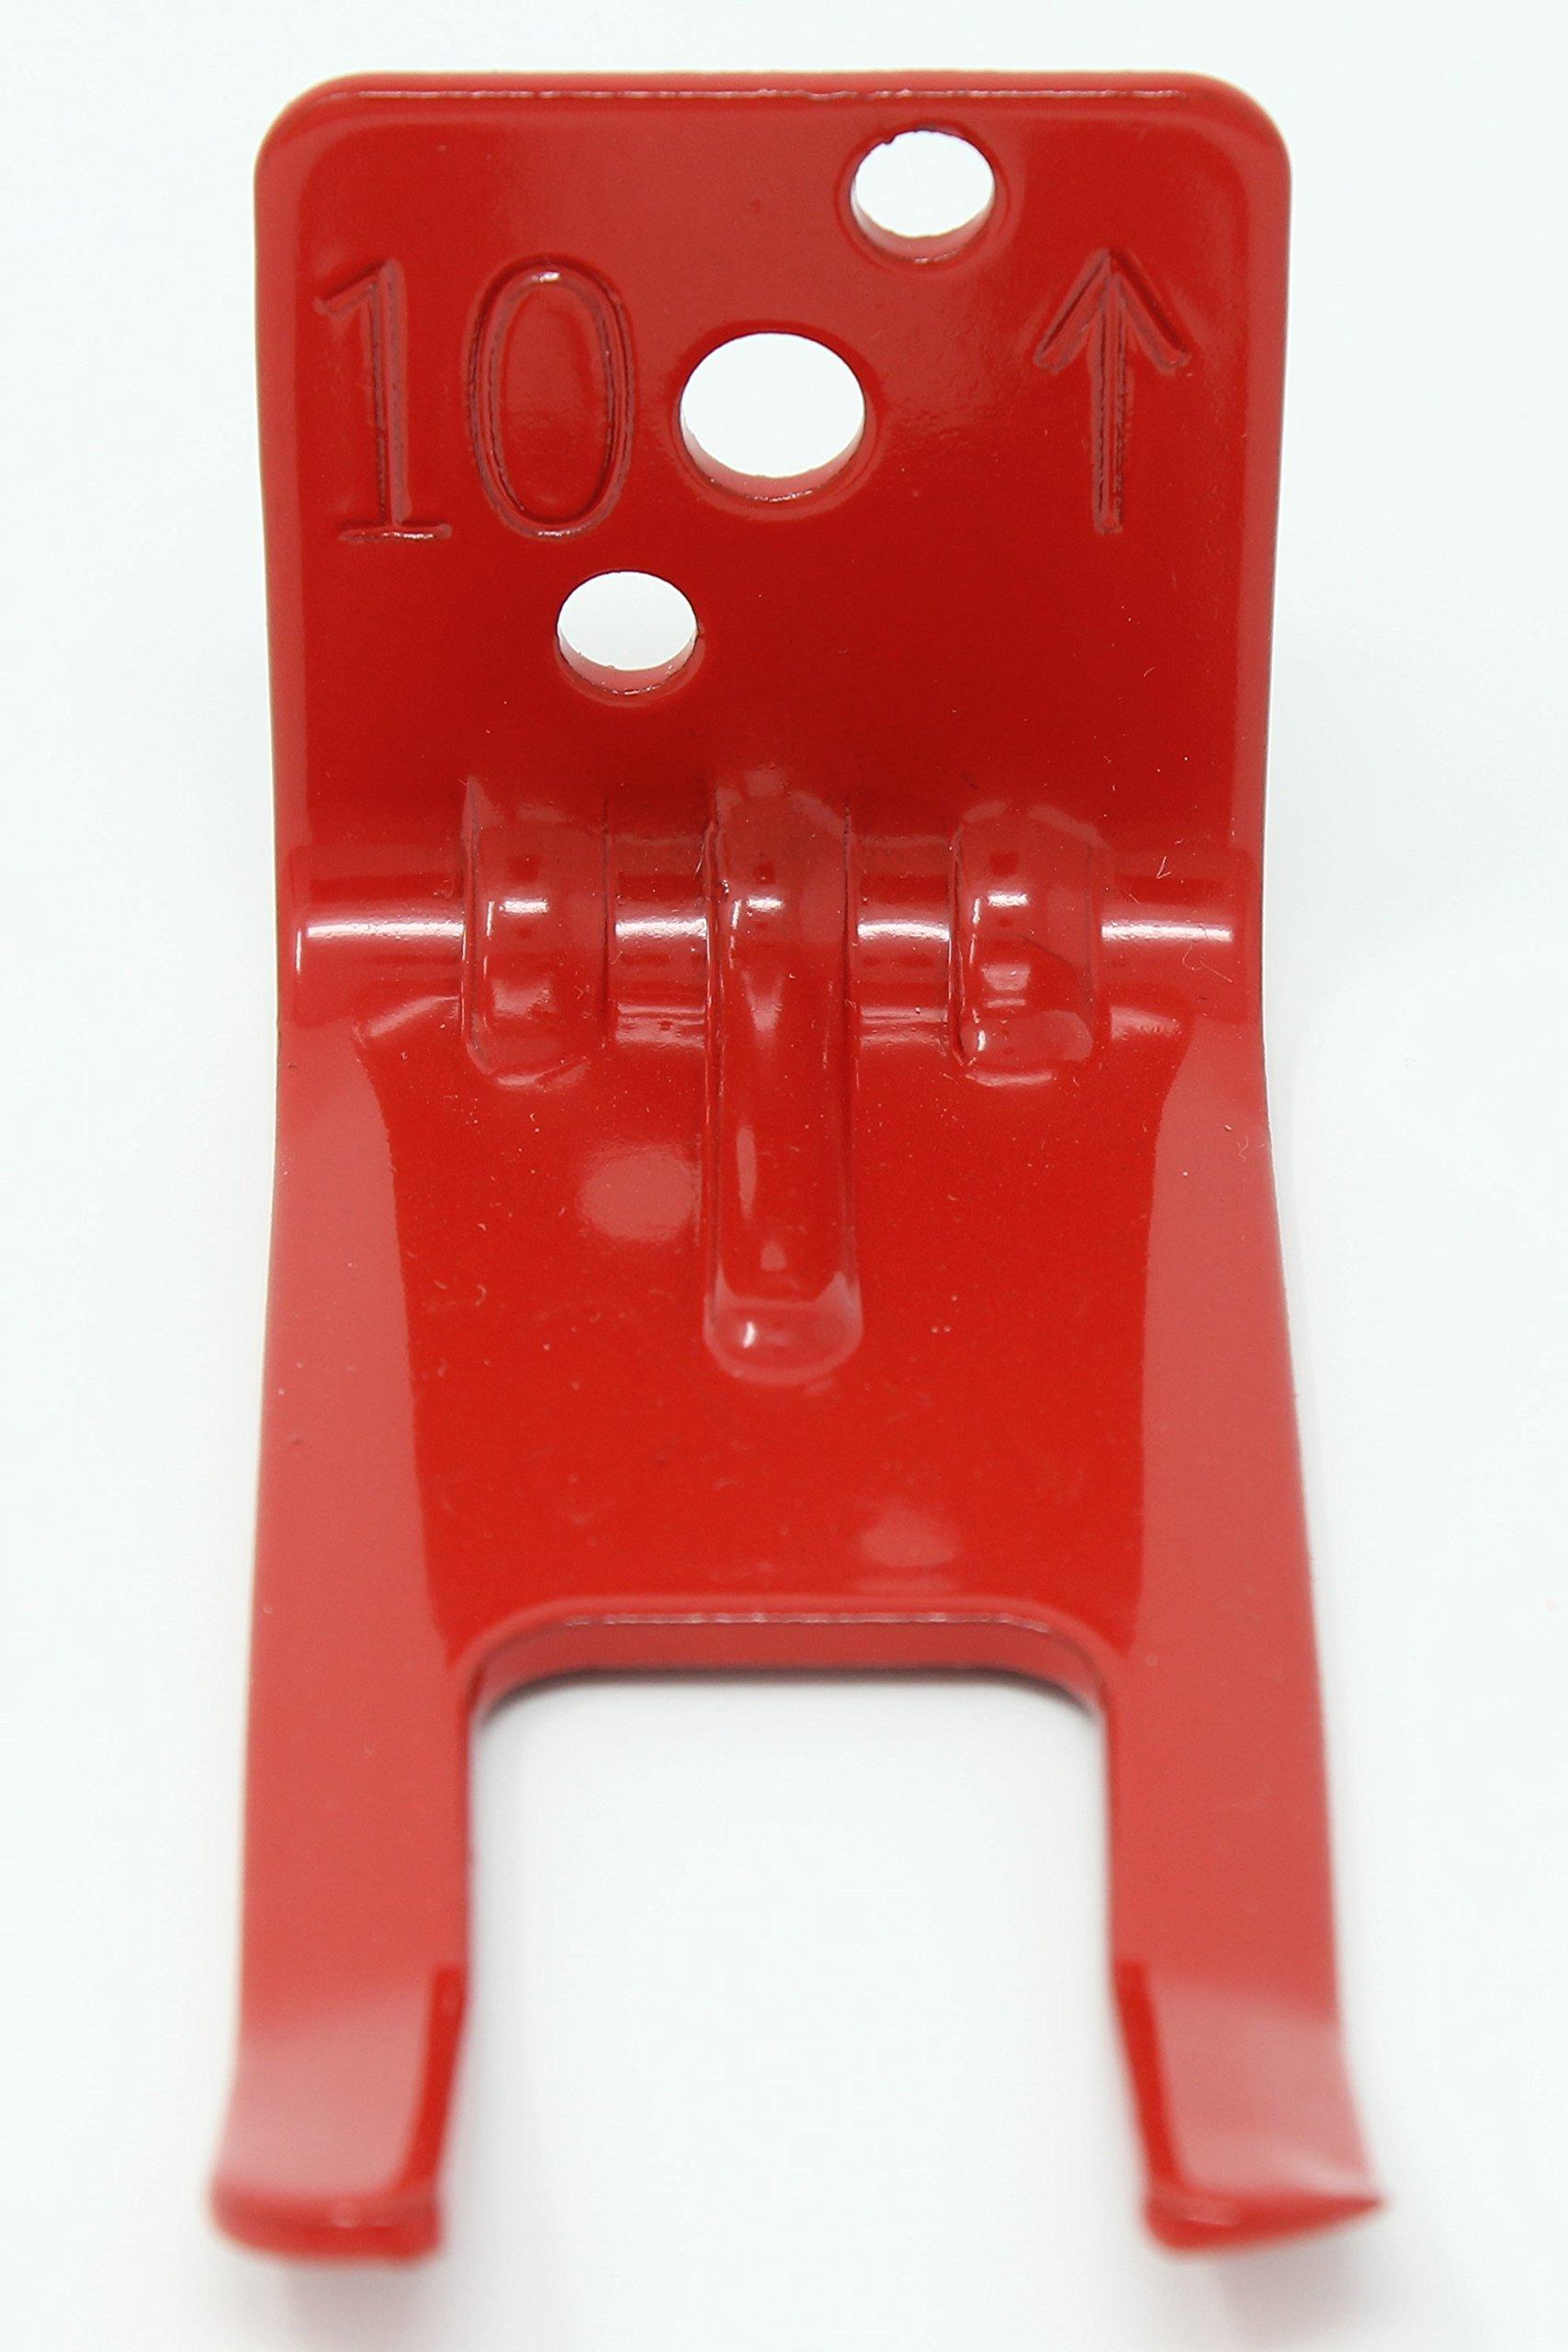 Fire Extinguisher Wall Mount - Fork Style Bracket (3, Large) by Extinguisher Experts (Image #3)